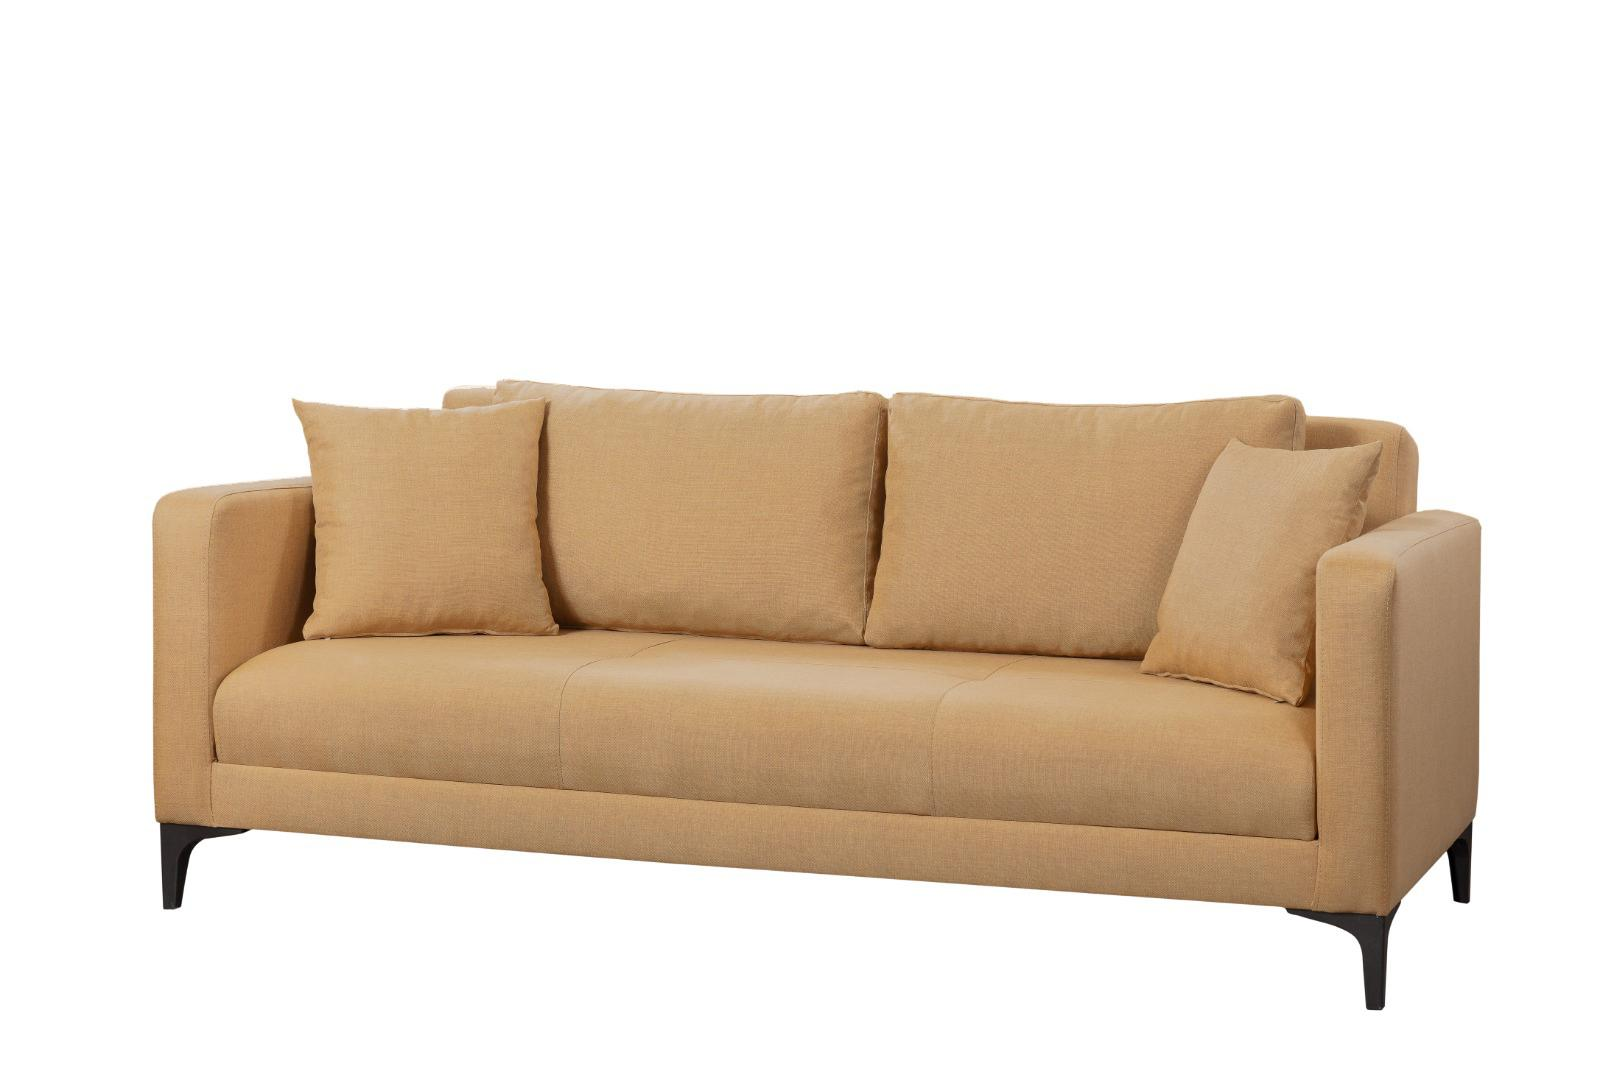 Canapea extensibila 3 locuri Gauge Concept Light Brown - Gauge Concept, Maro